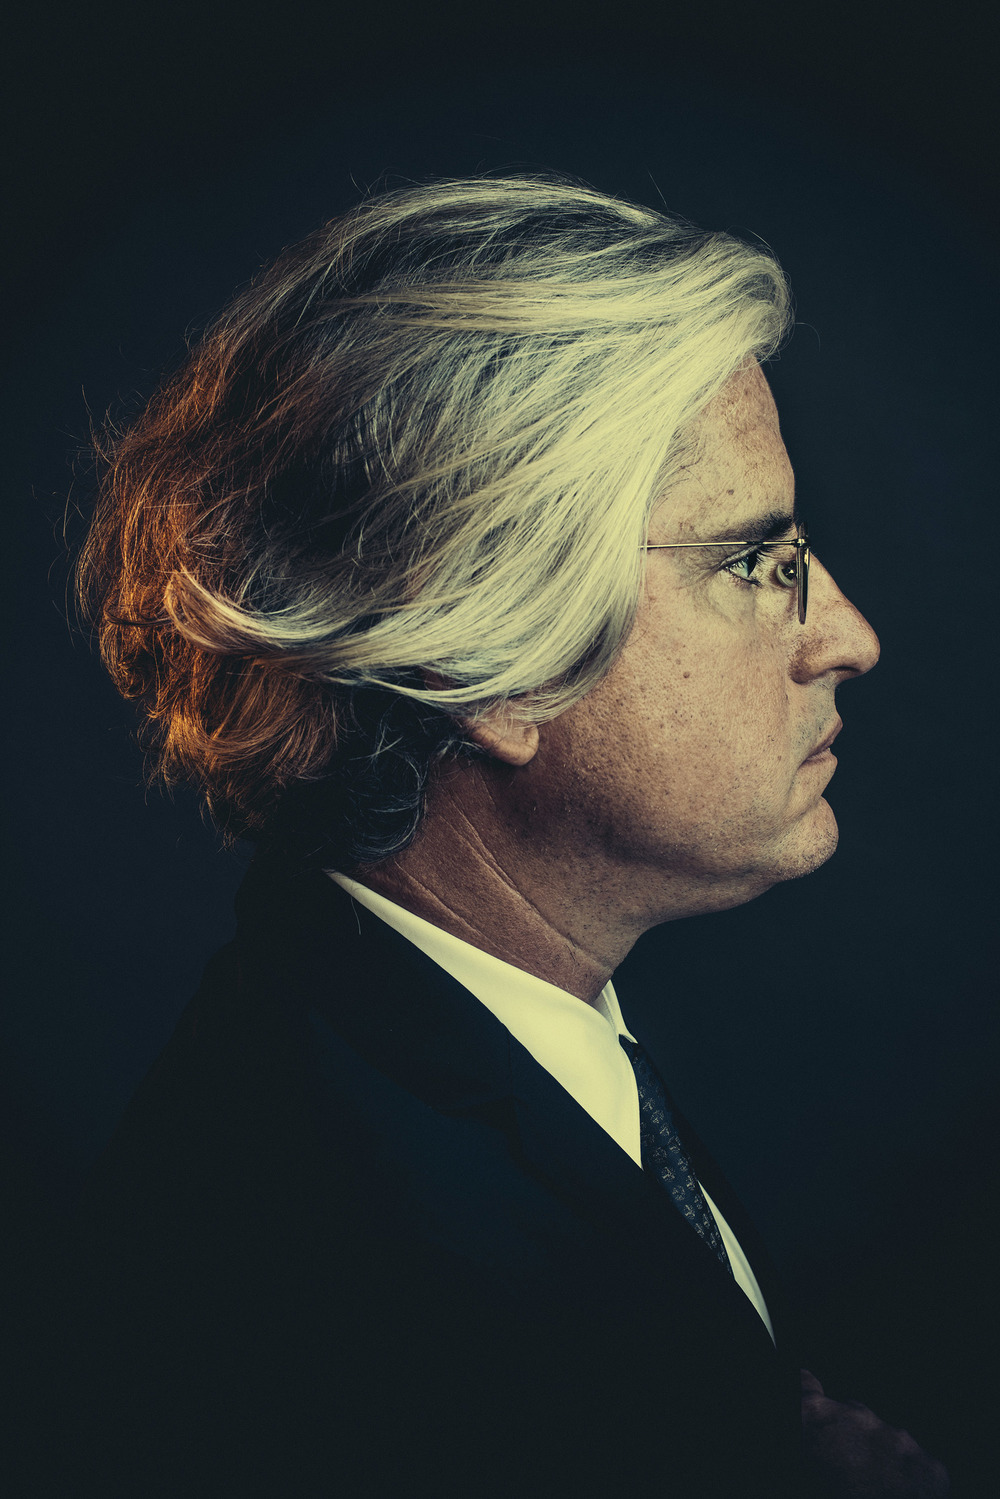 Democratic political operative David Brock for TIME Magazine